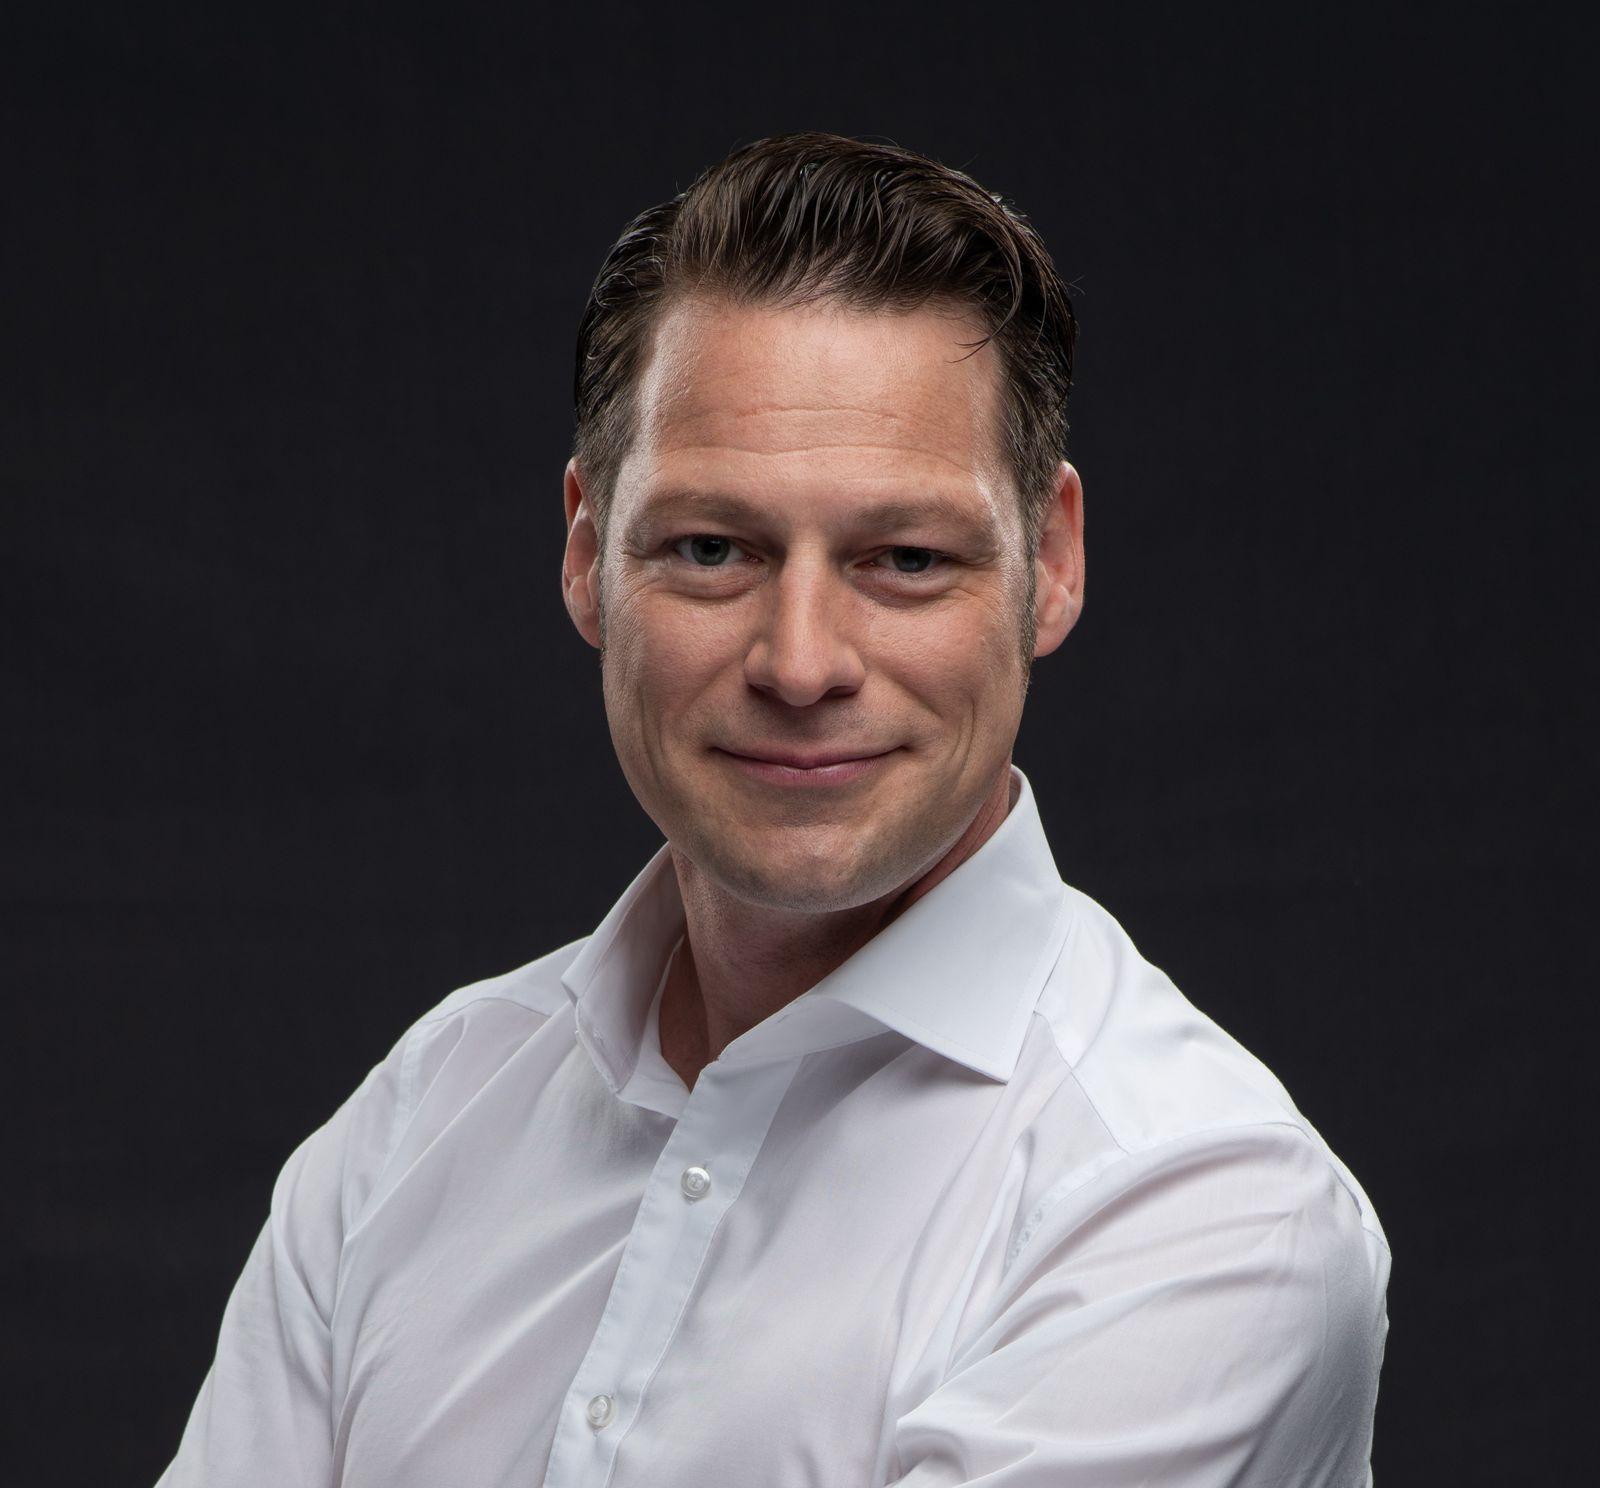 Dirk Abendroth